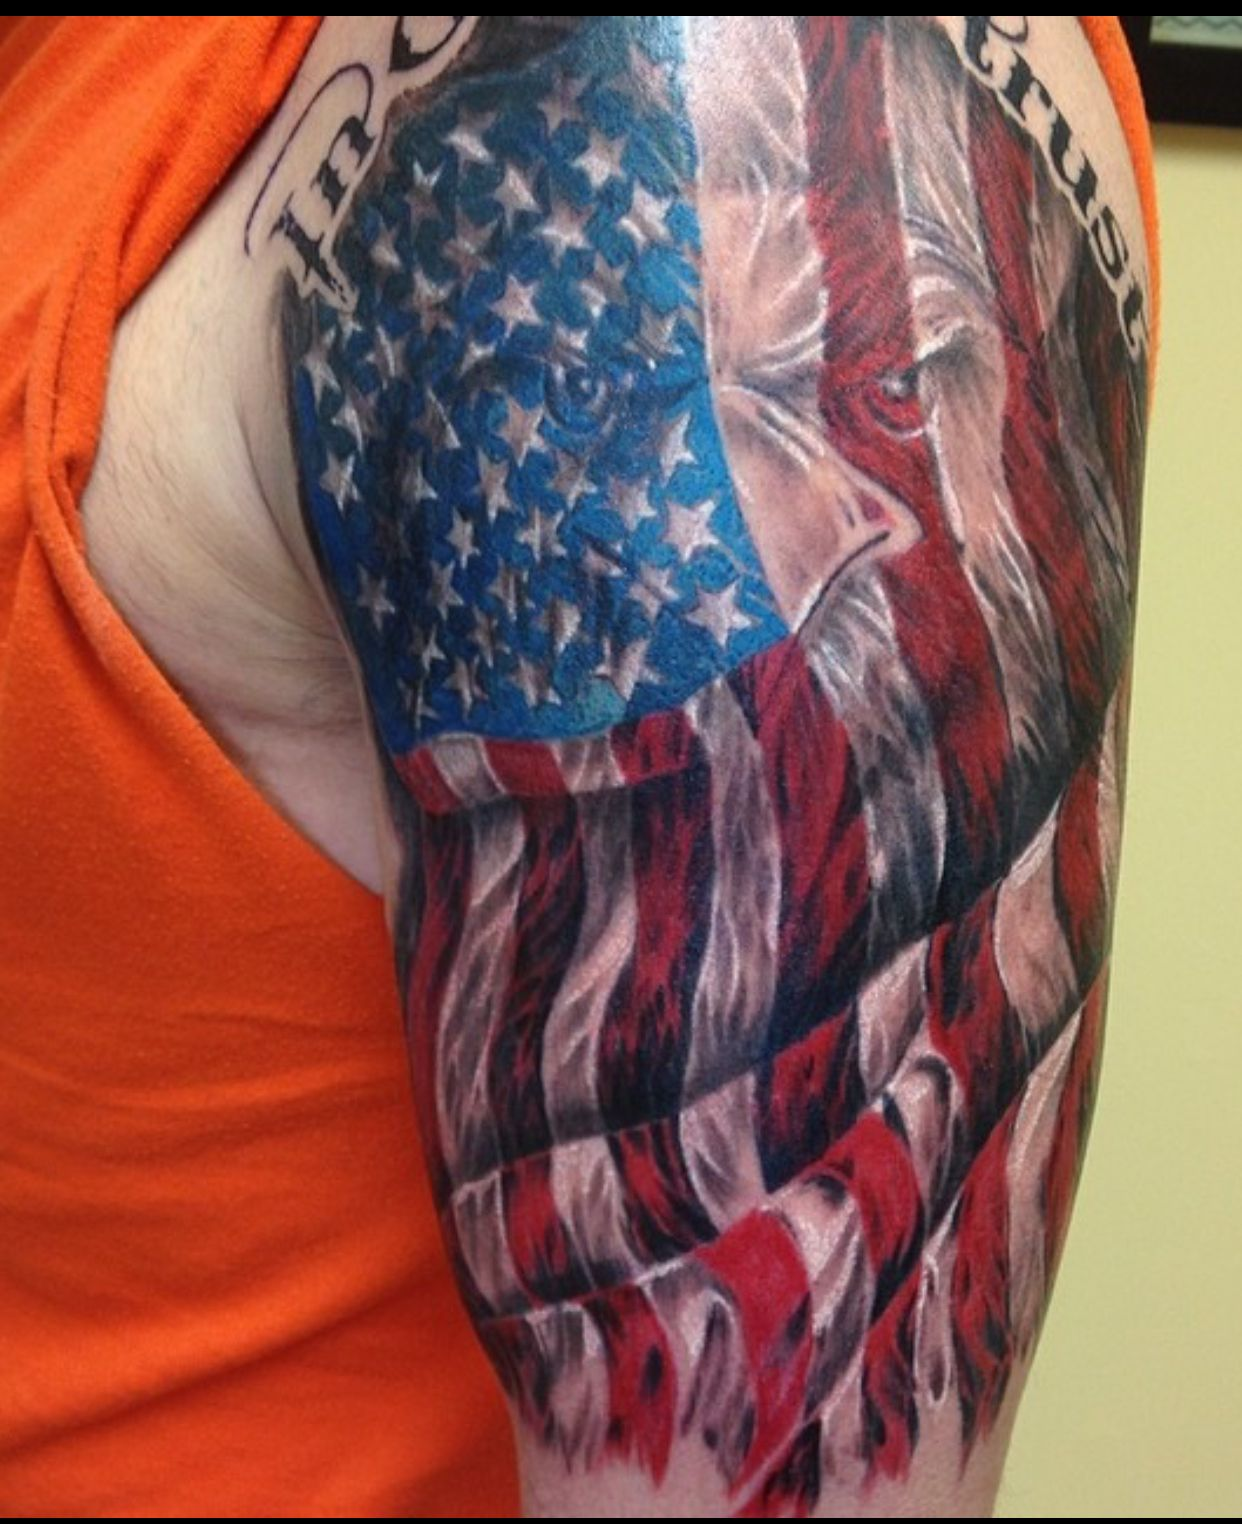 Tattoo Ideas Us: Pin By John Marker On Art Design